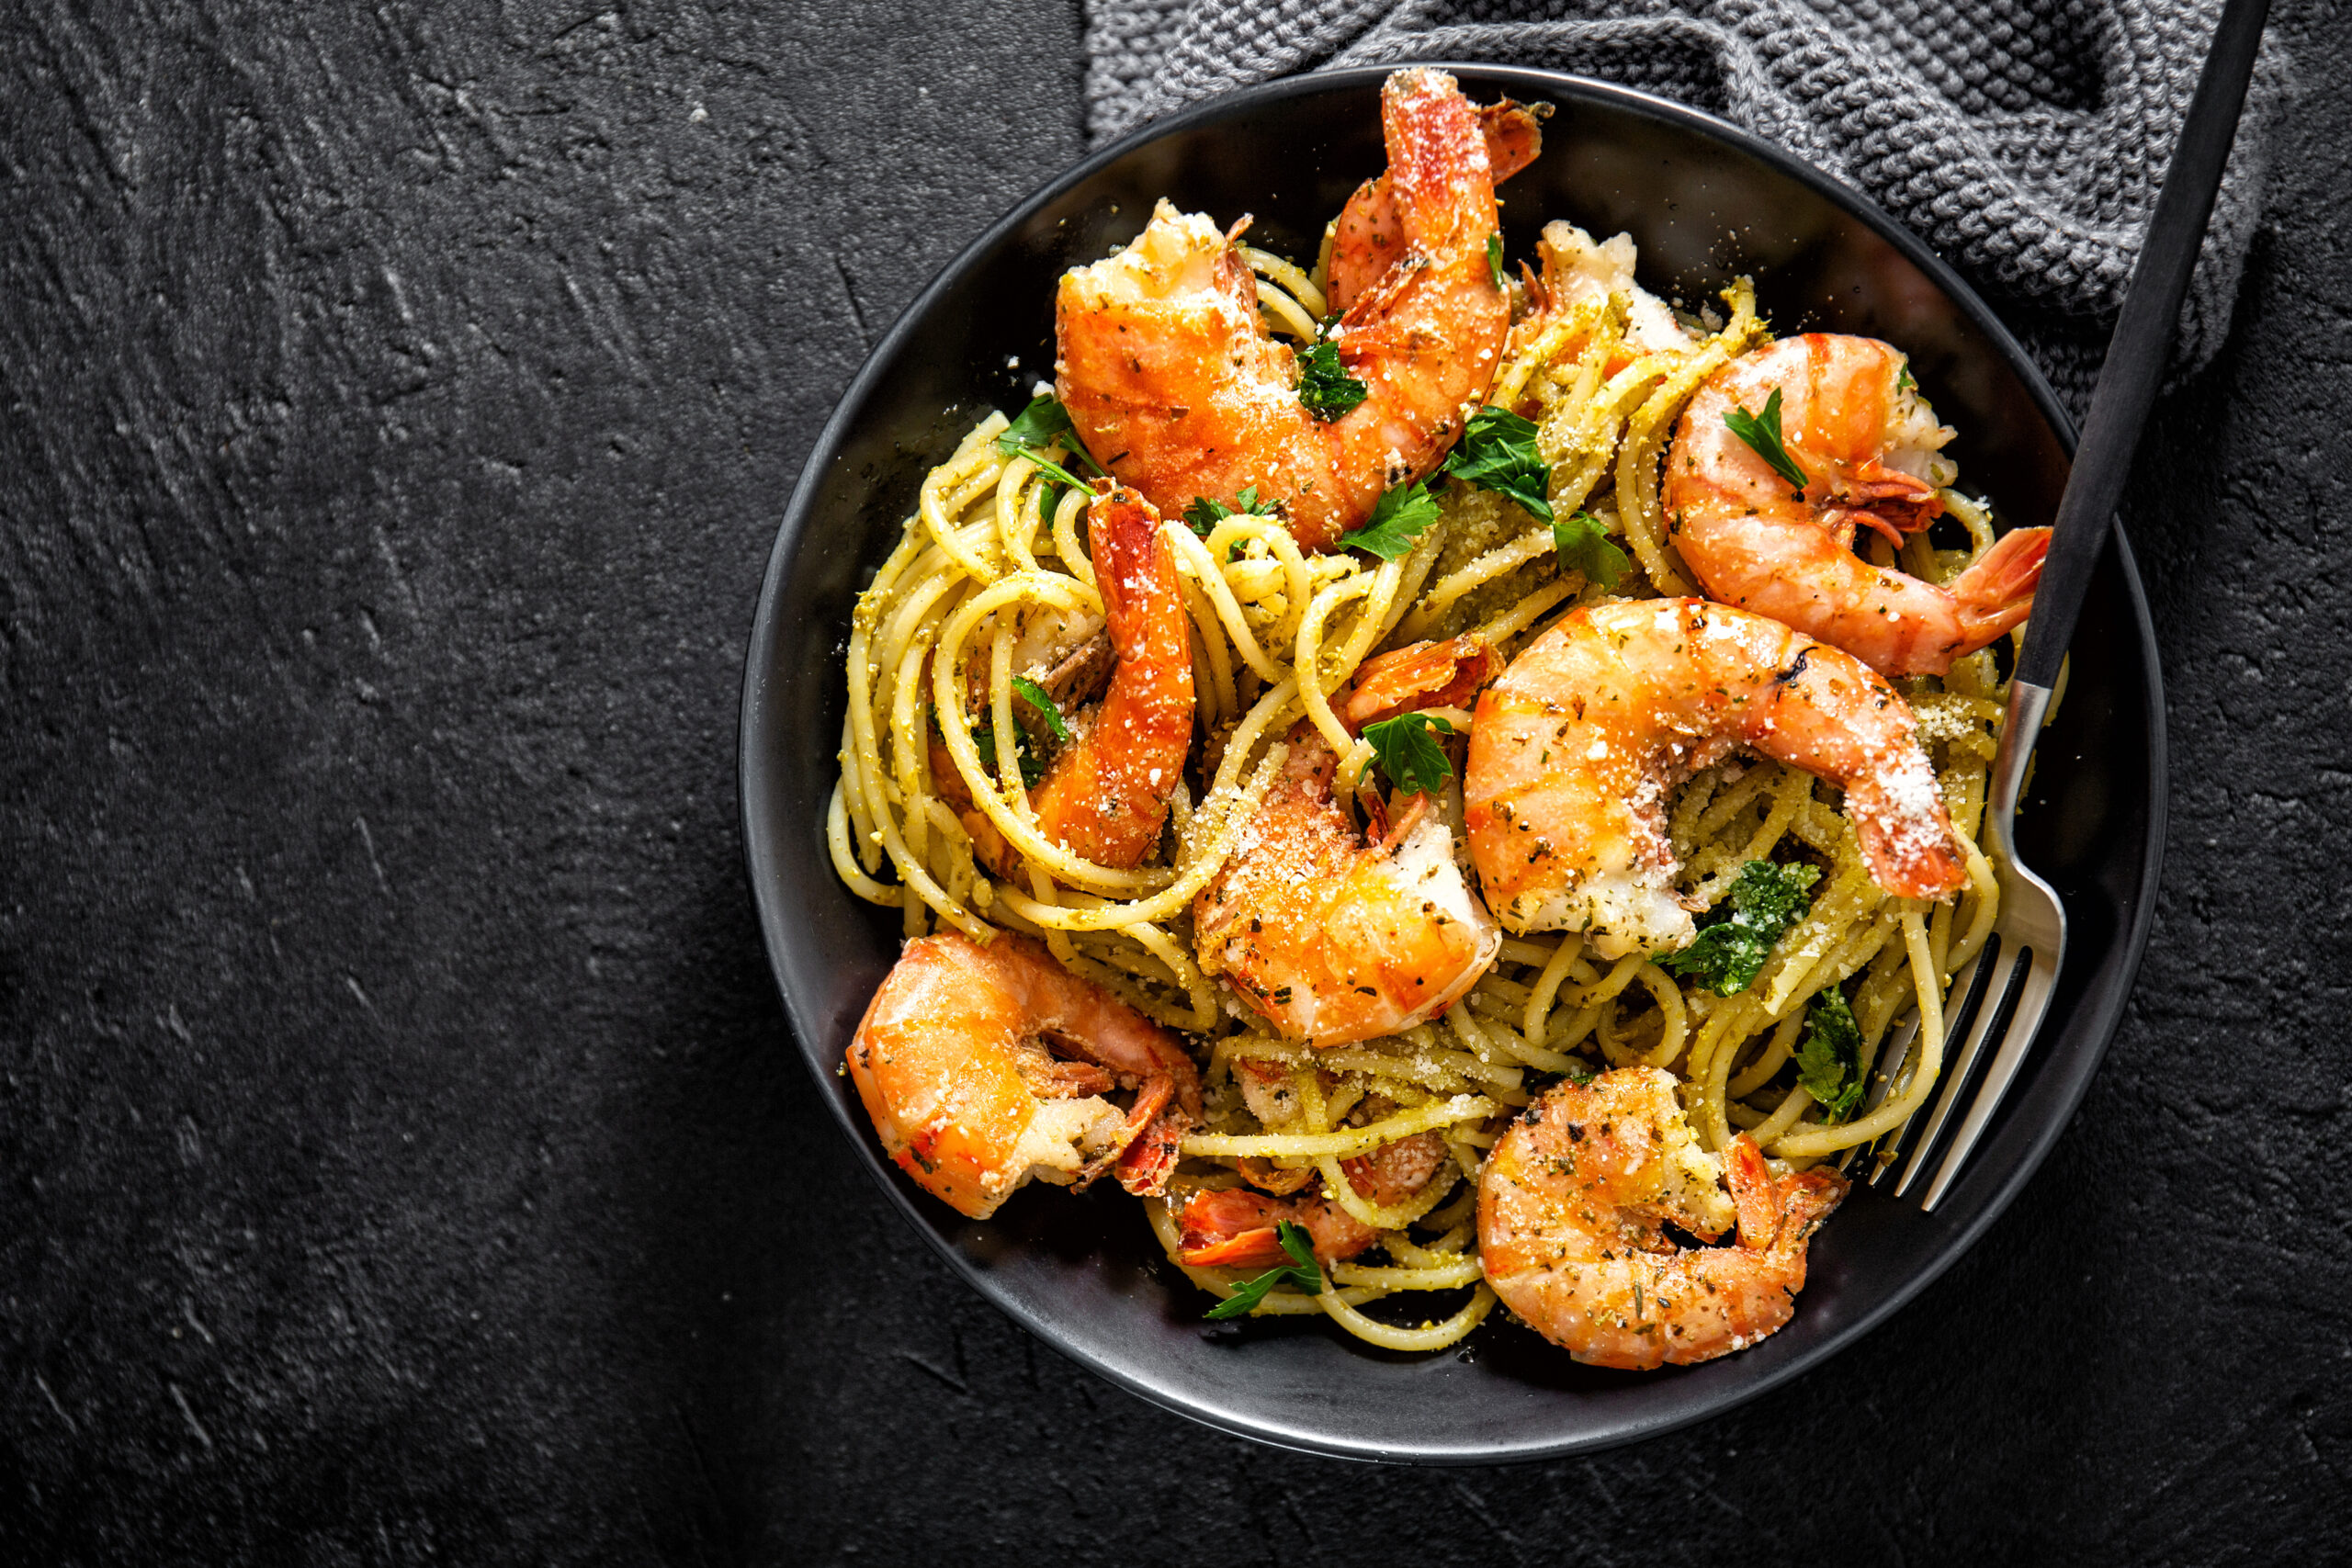 Scampi mit Pasta Aglio e Olio aus de Kieslich Gewürzmanufaktur